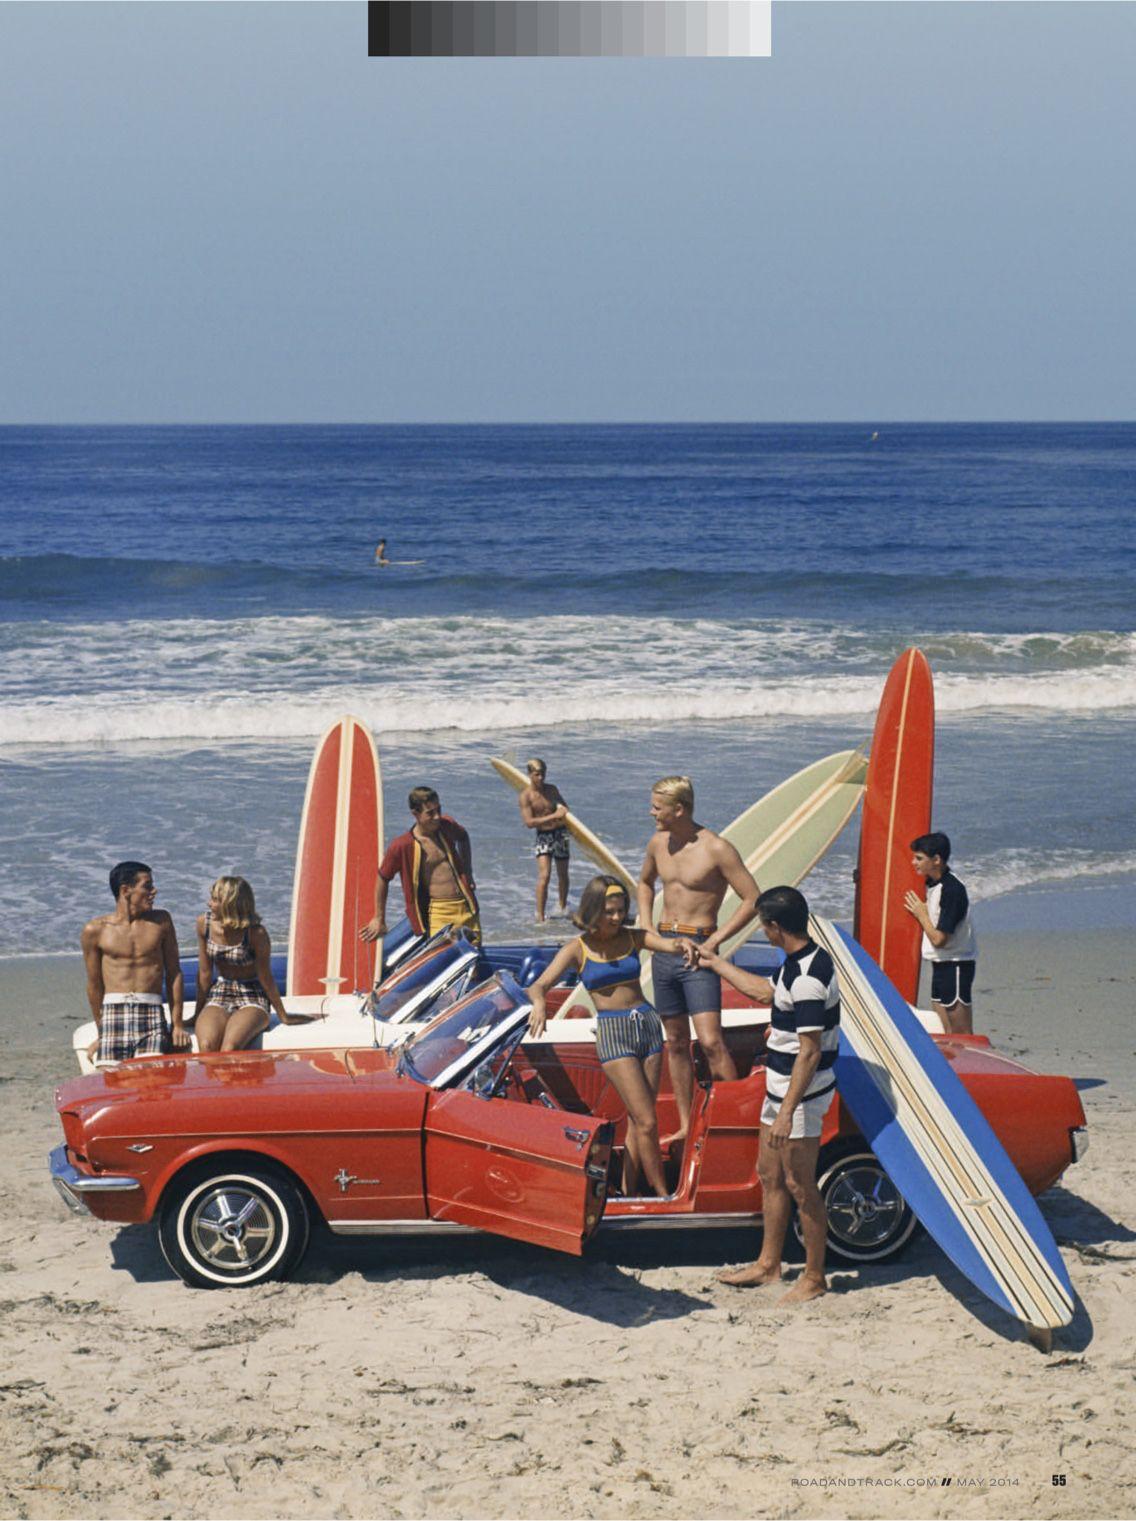 1967 mustang convertible vintage surf vintage vibes big waves longboards surfs